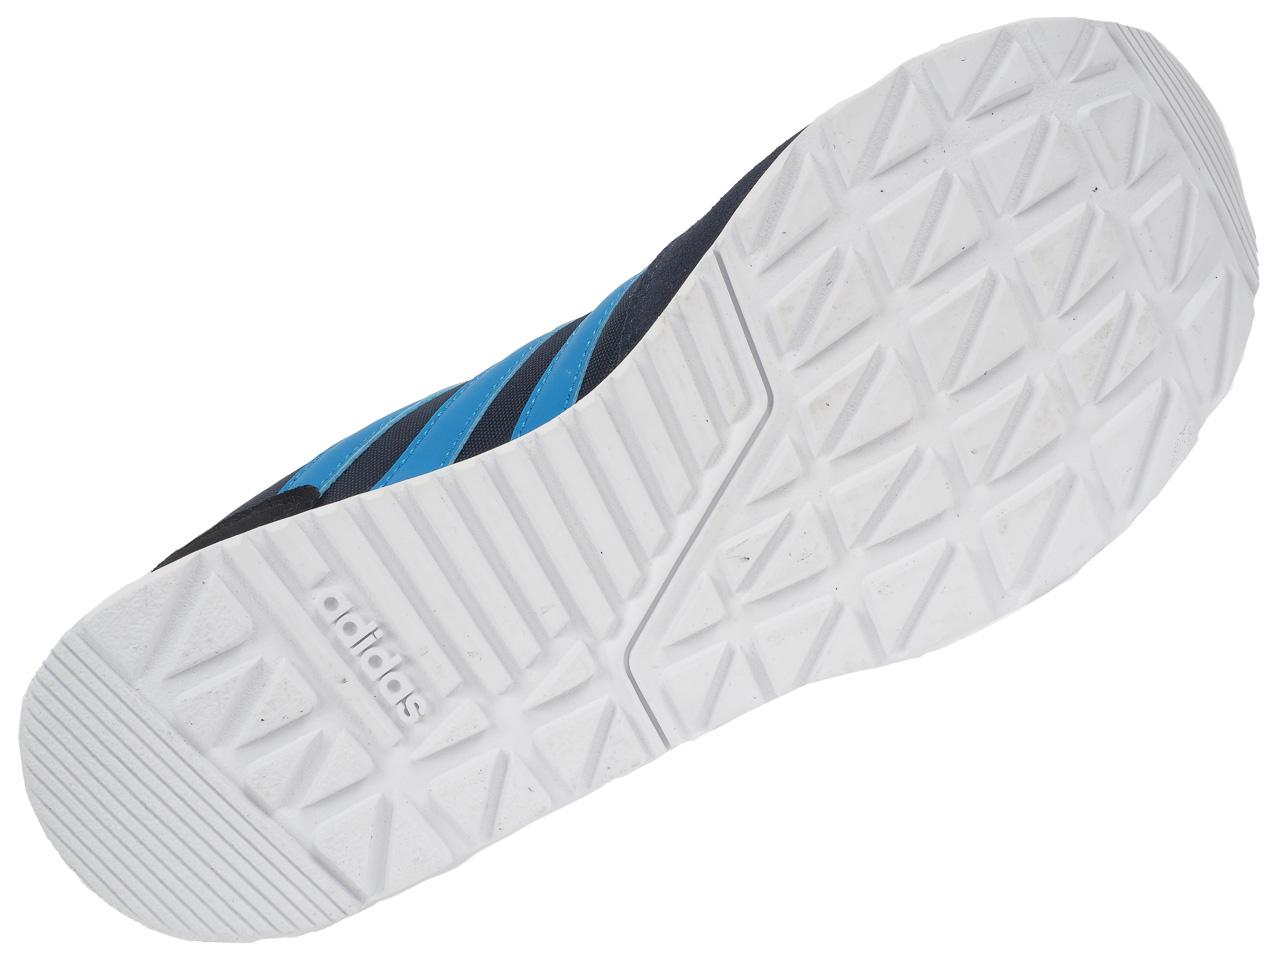 Adidas NEO 8K Sneaker